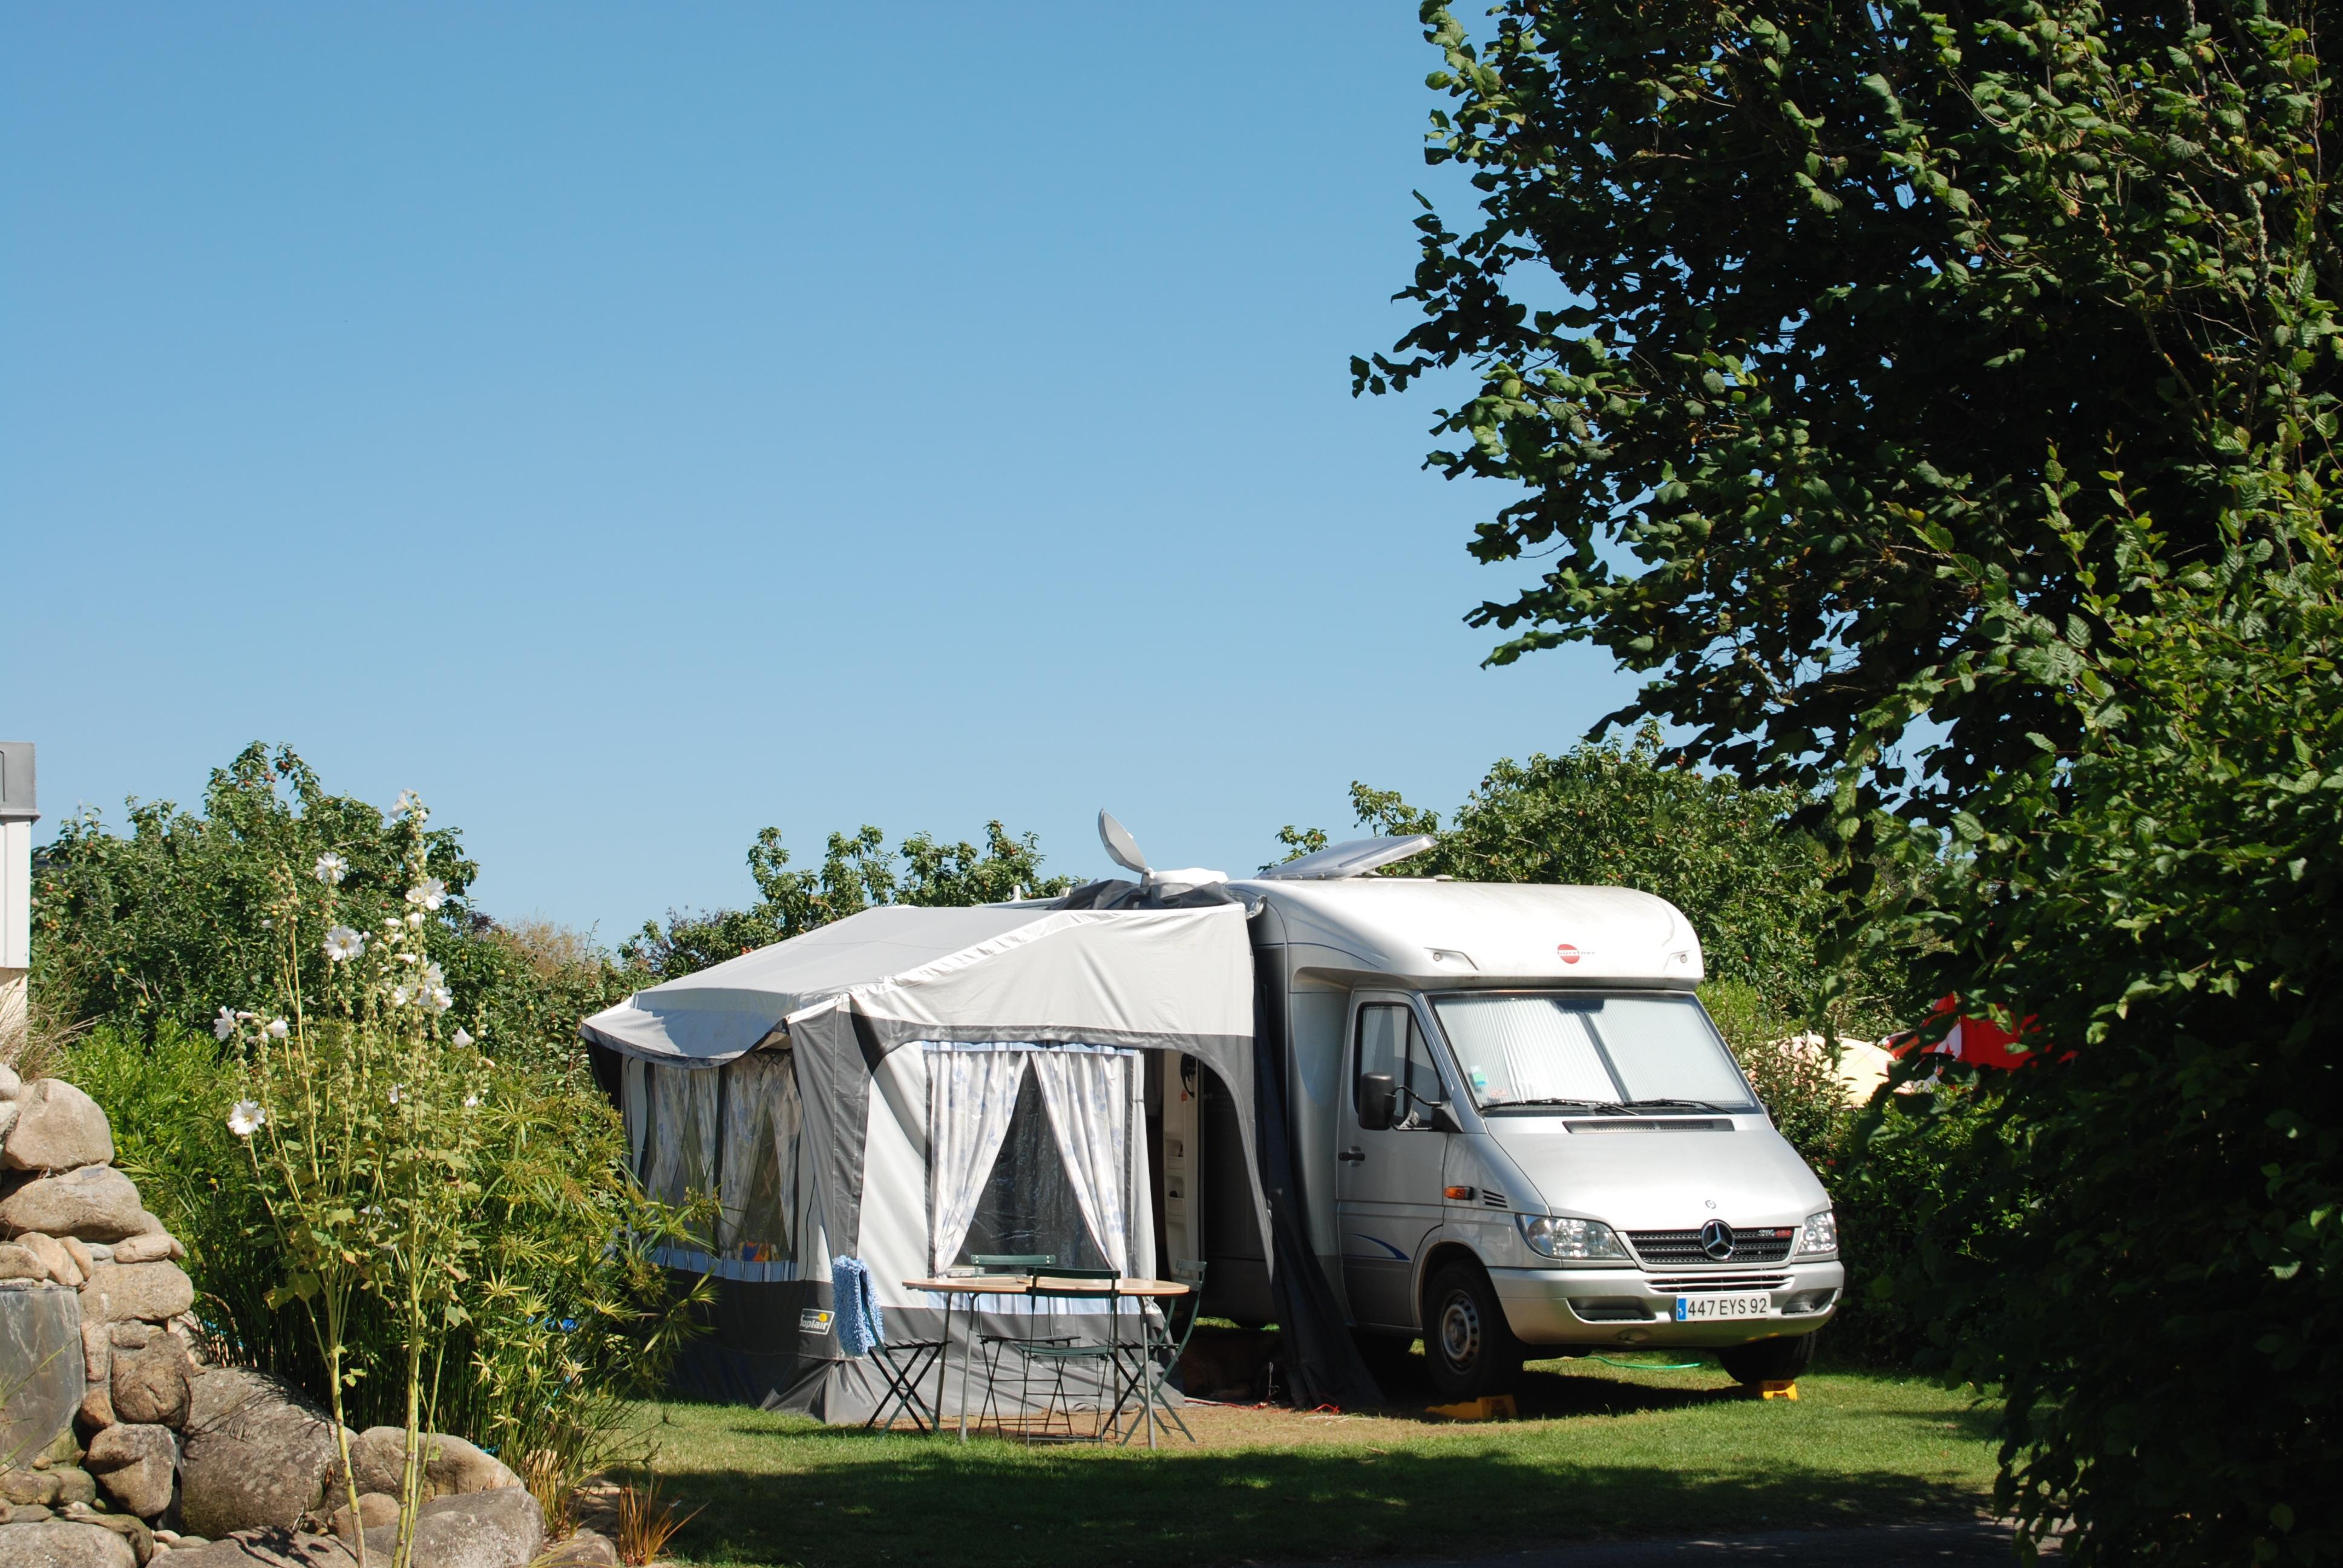 Camping les Embruns, Clohars-Carnoet, Finistère